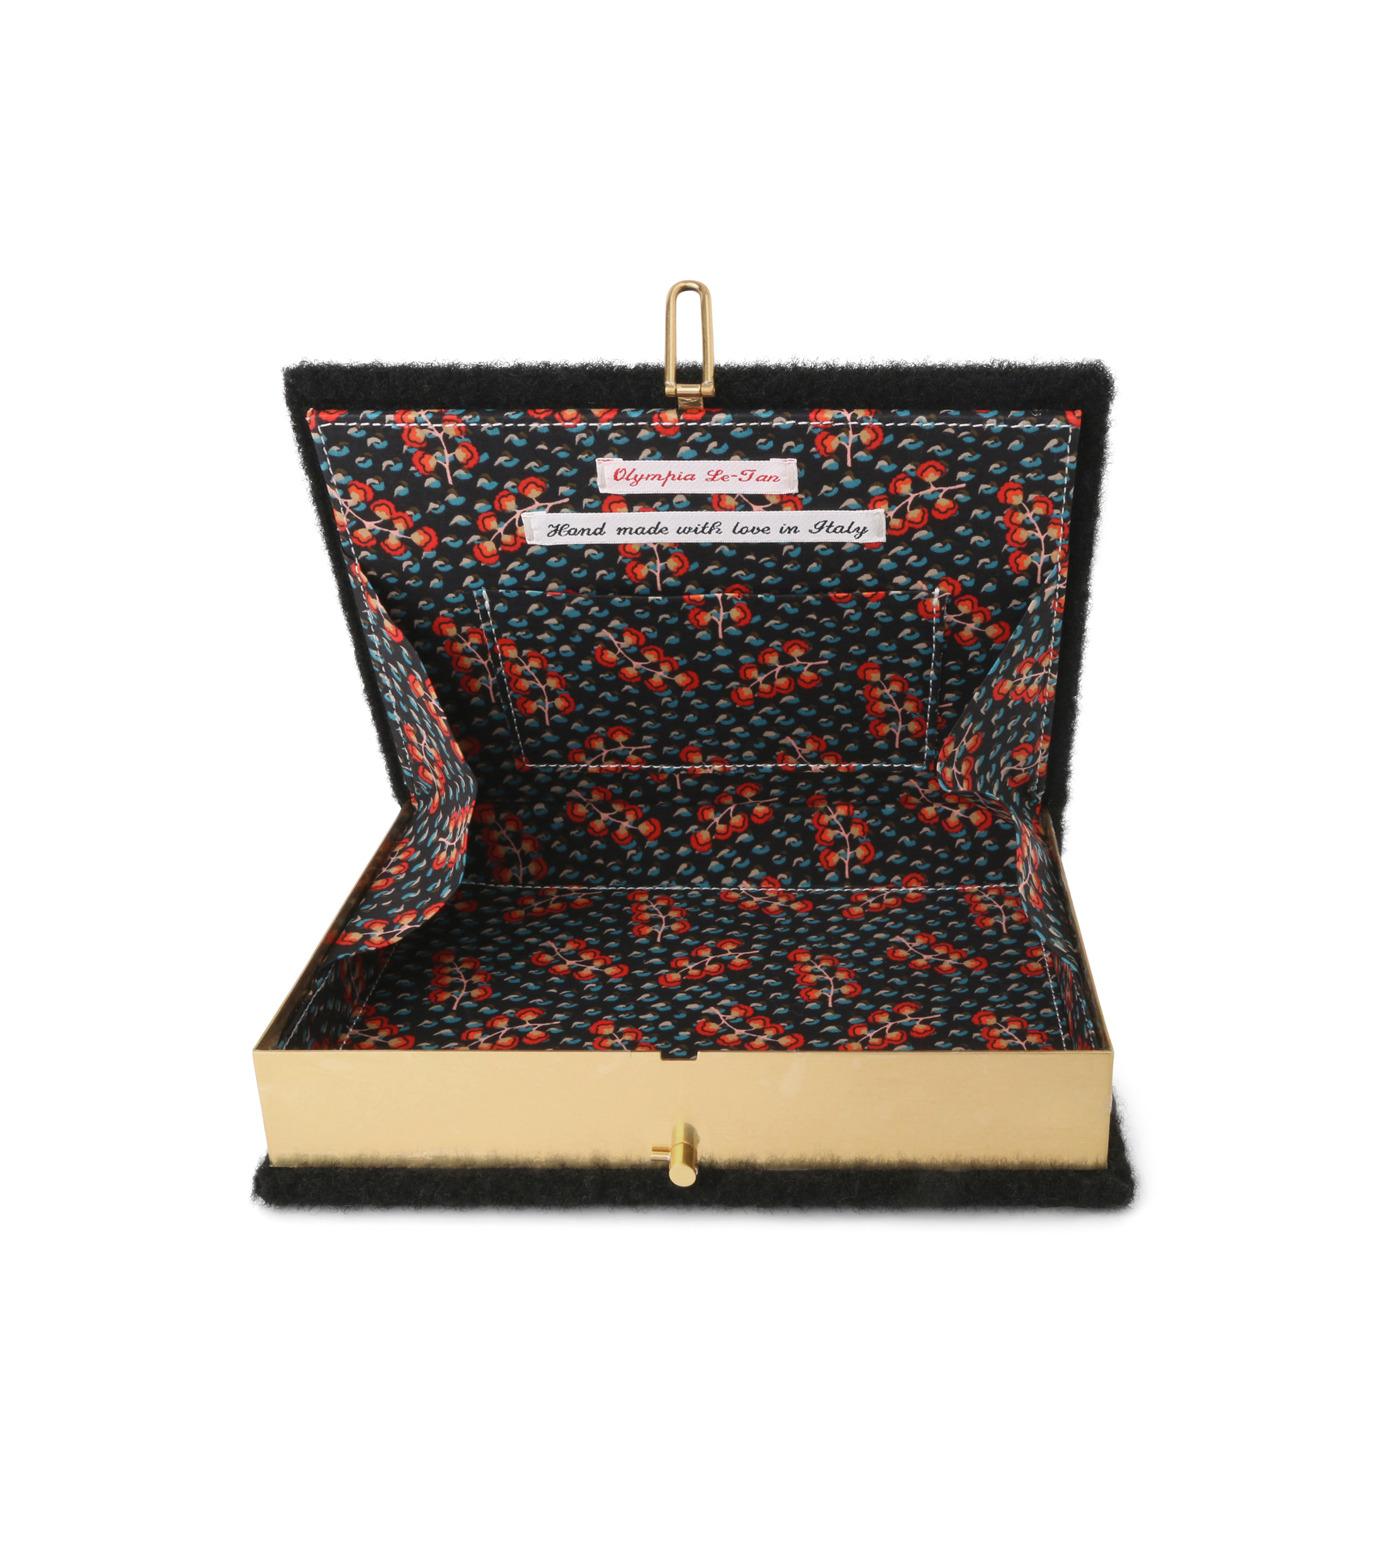 Olympia Le-Tan(オリンピア ルタン)のBook Clutch Velcro-BLACK(クラッチバッグ/clutch bag)-FW16BBC024-13 拡大詳細画像4